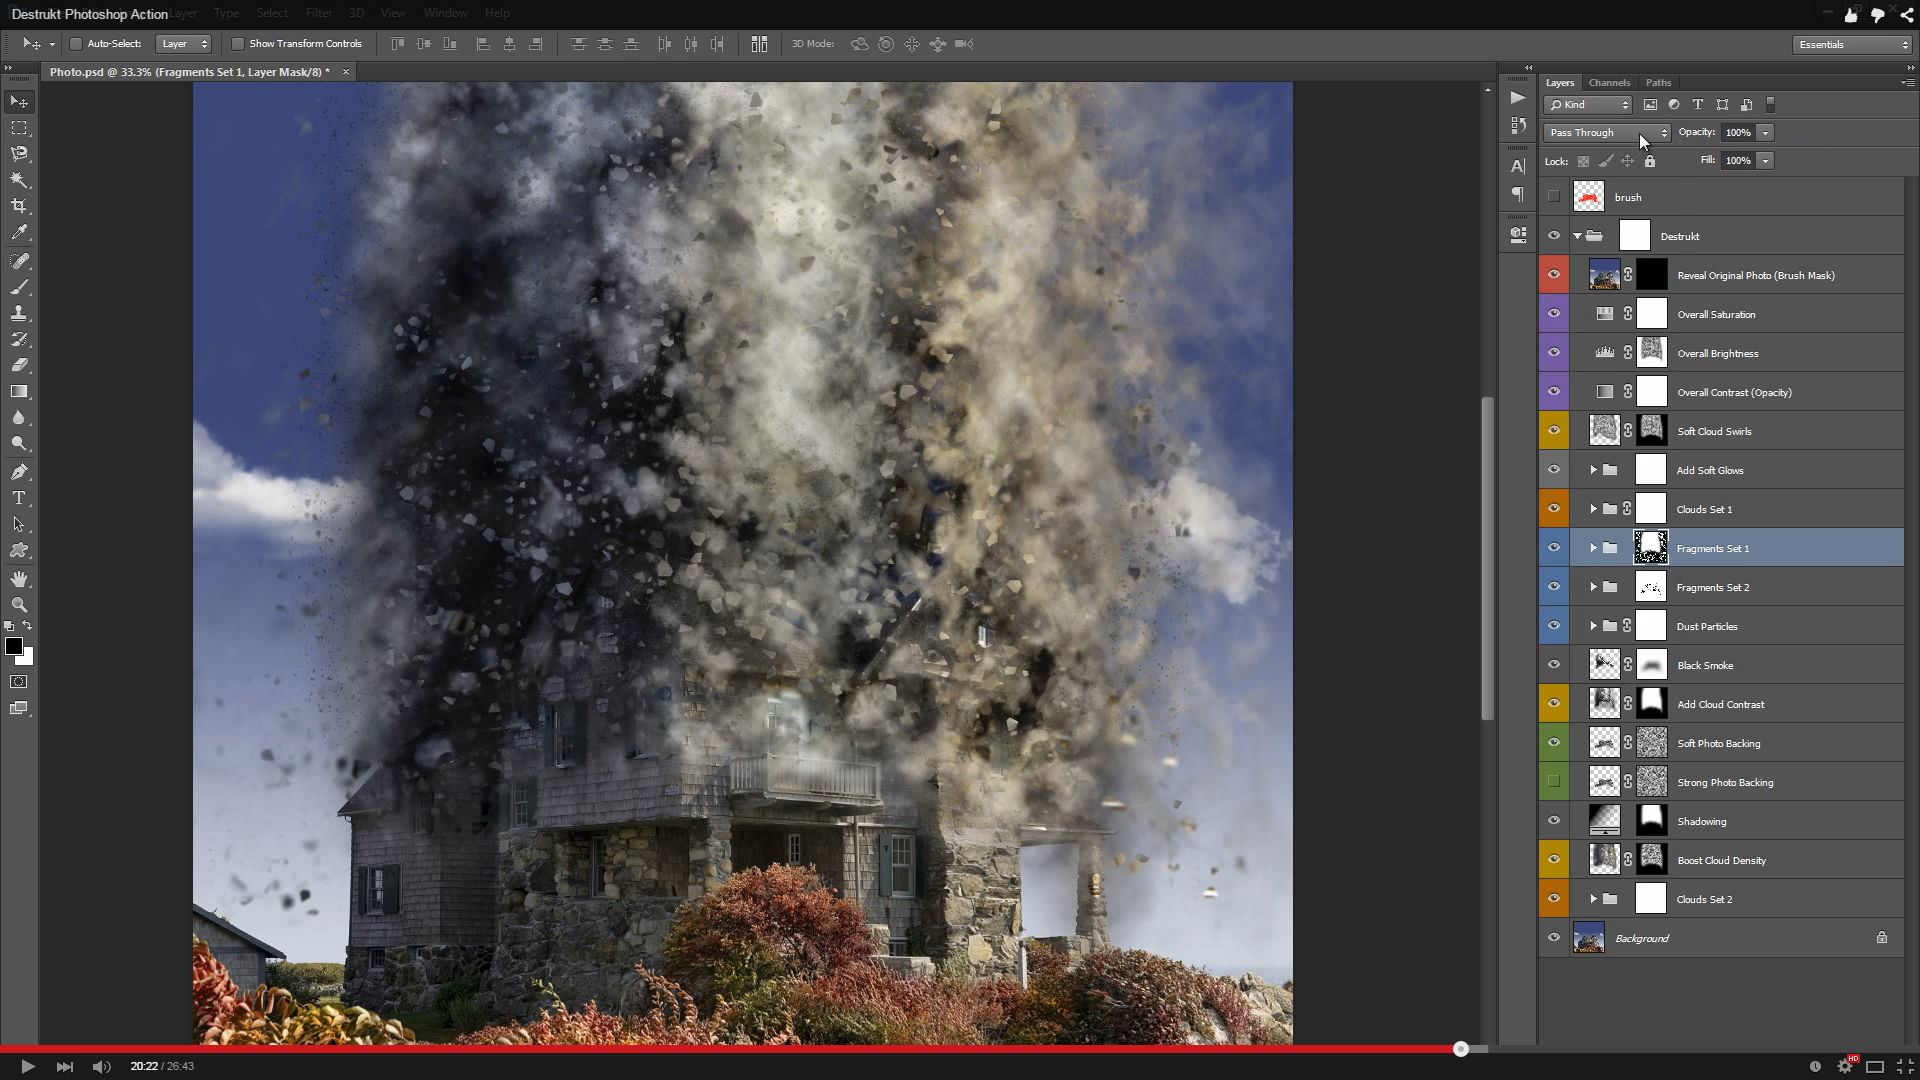 Destrukt Photoshop Action